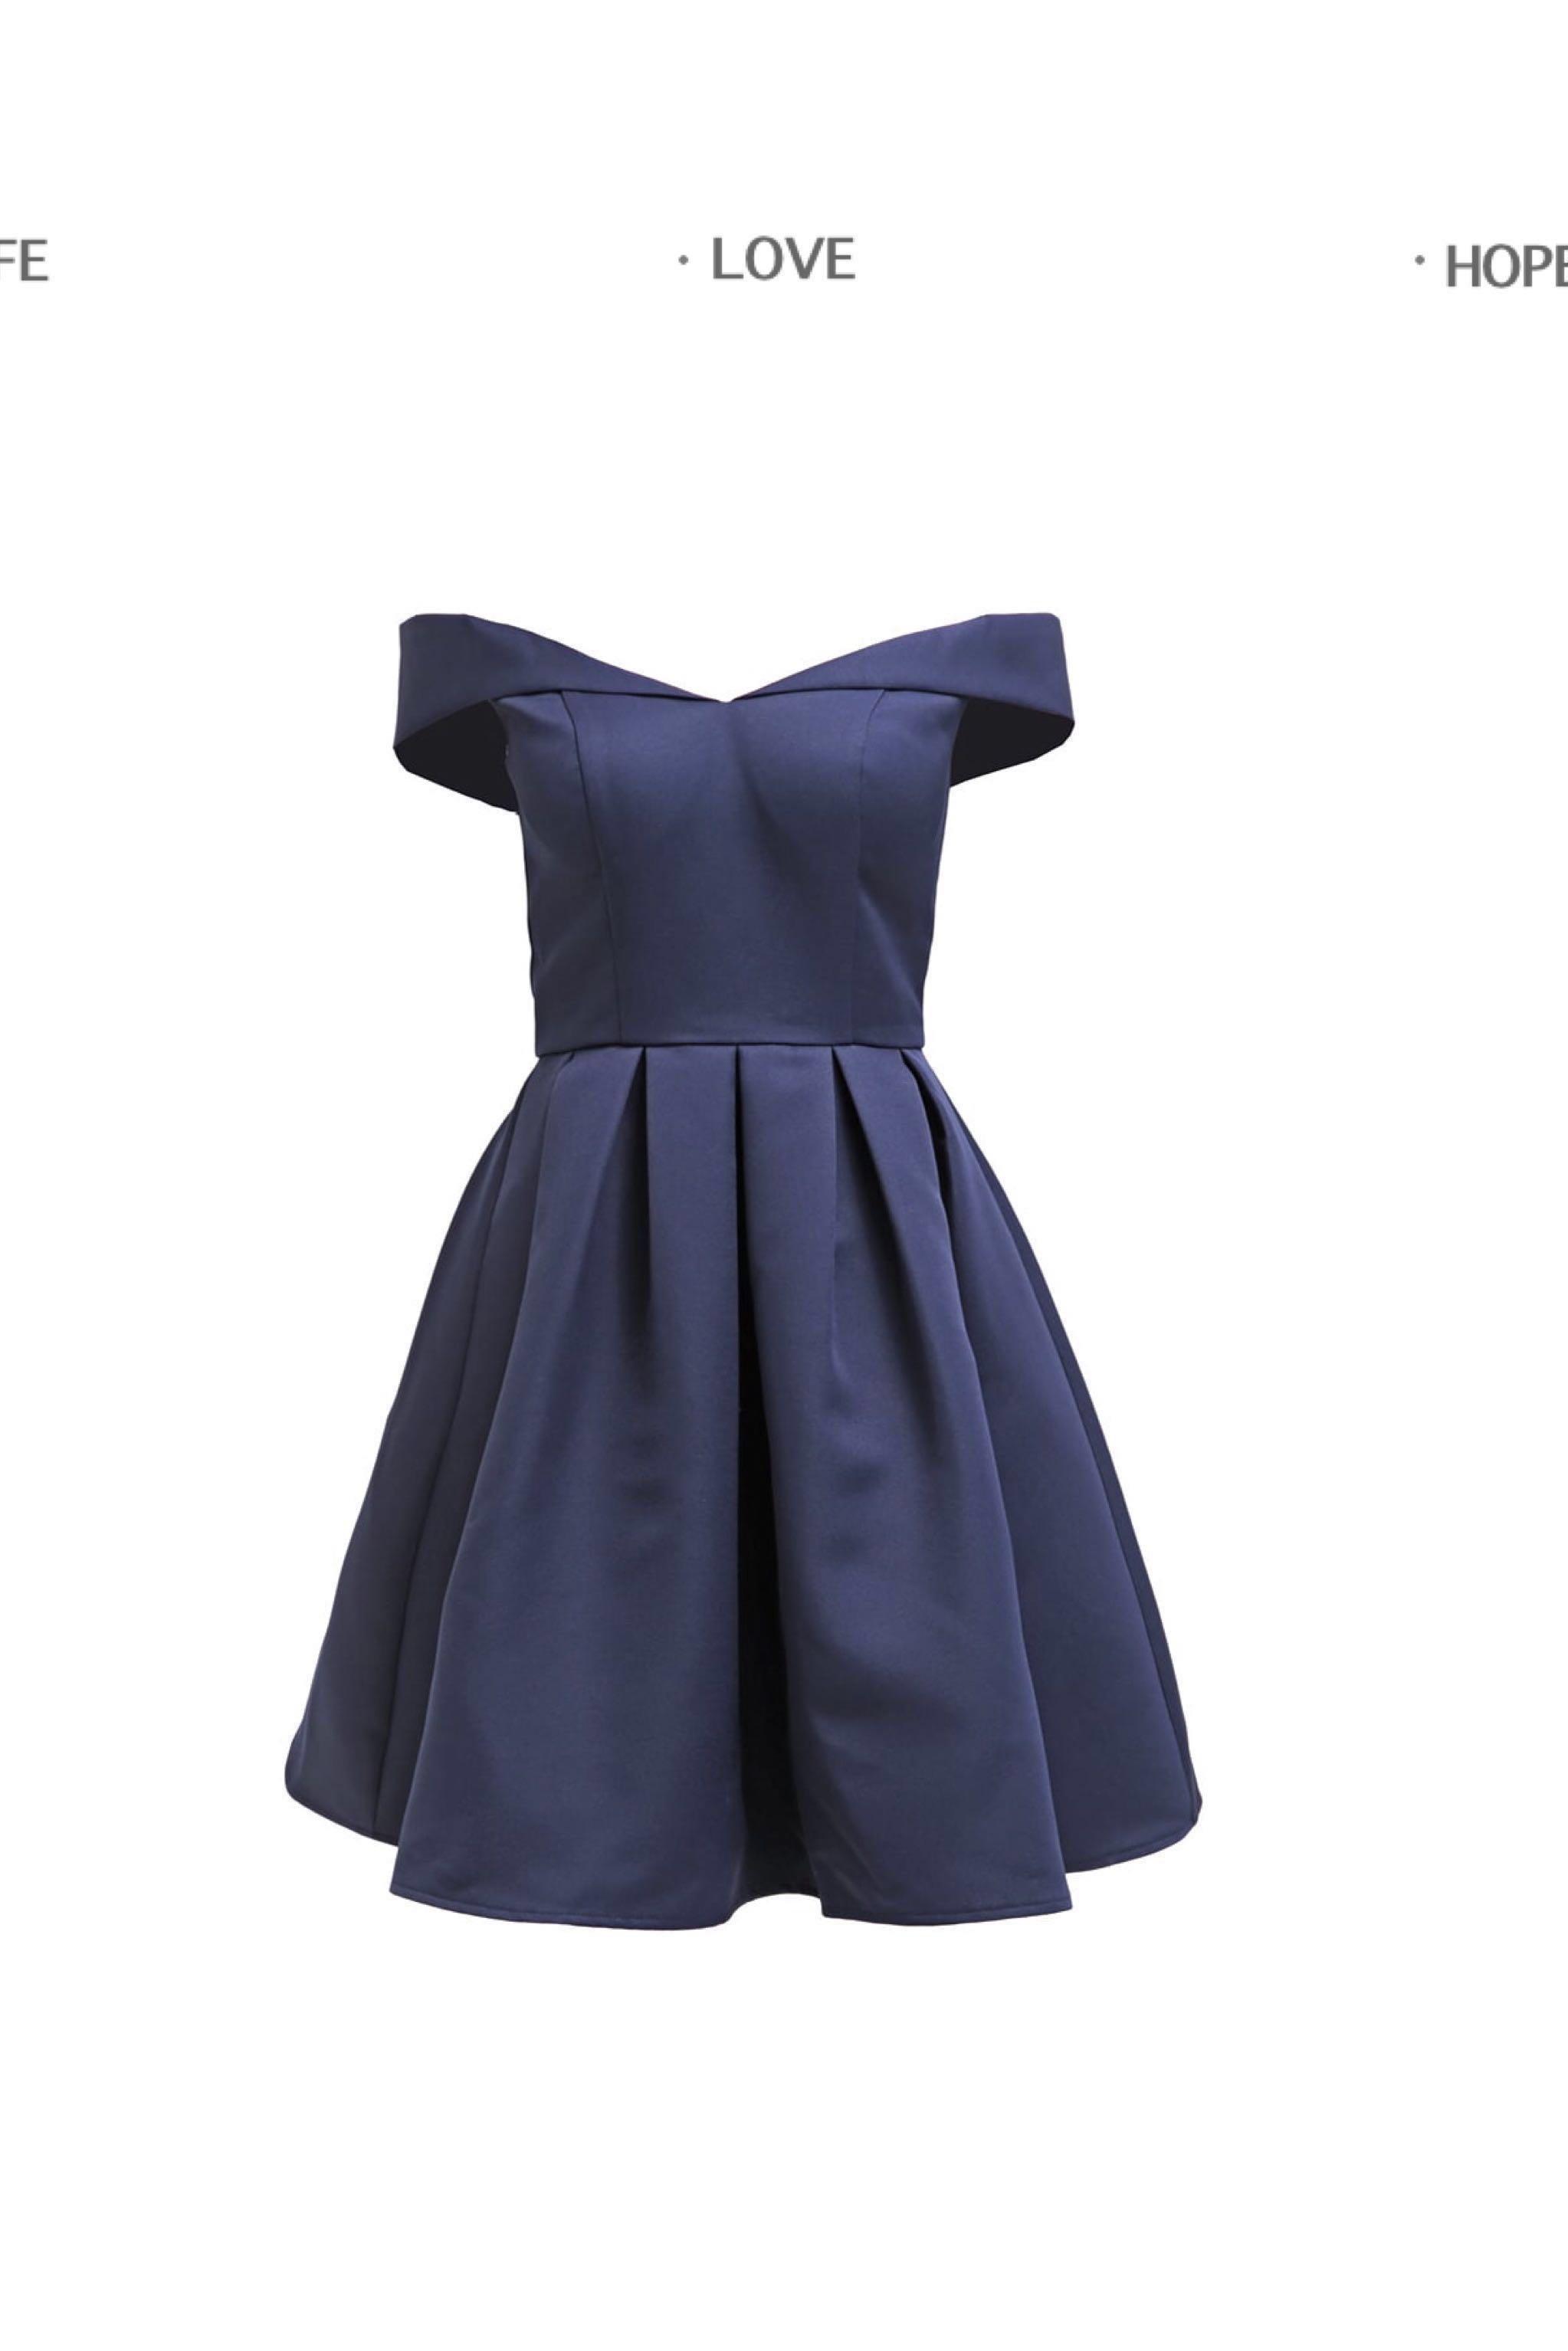 0be53993e5 [FREE SHIPPING] Chi Chi London Portia Dress UK 10